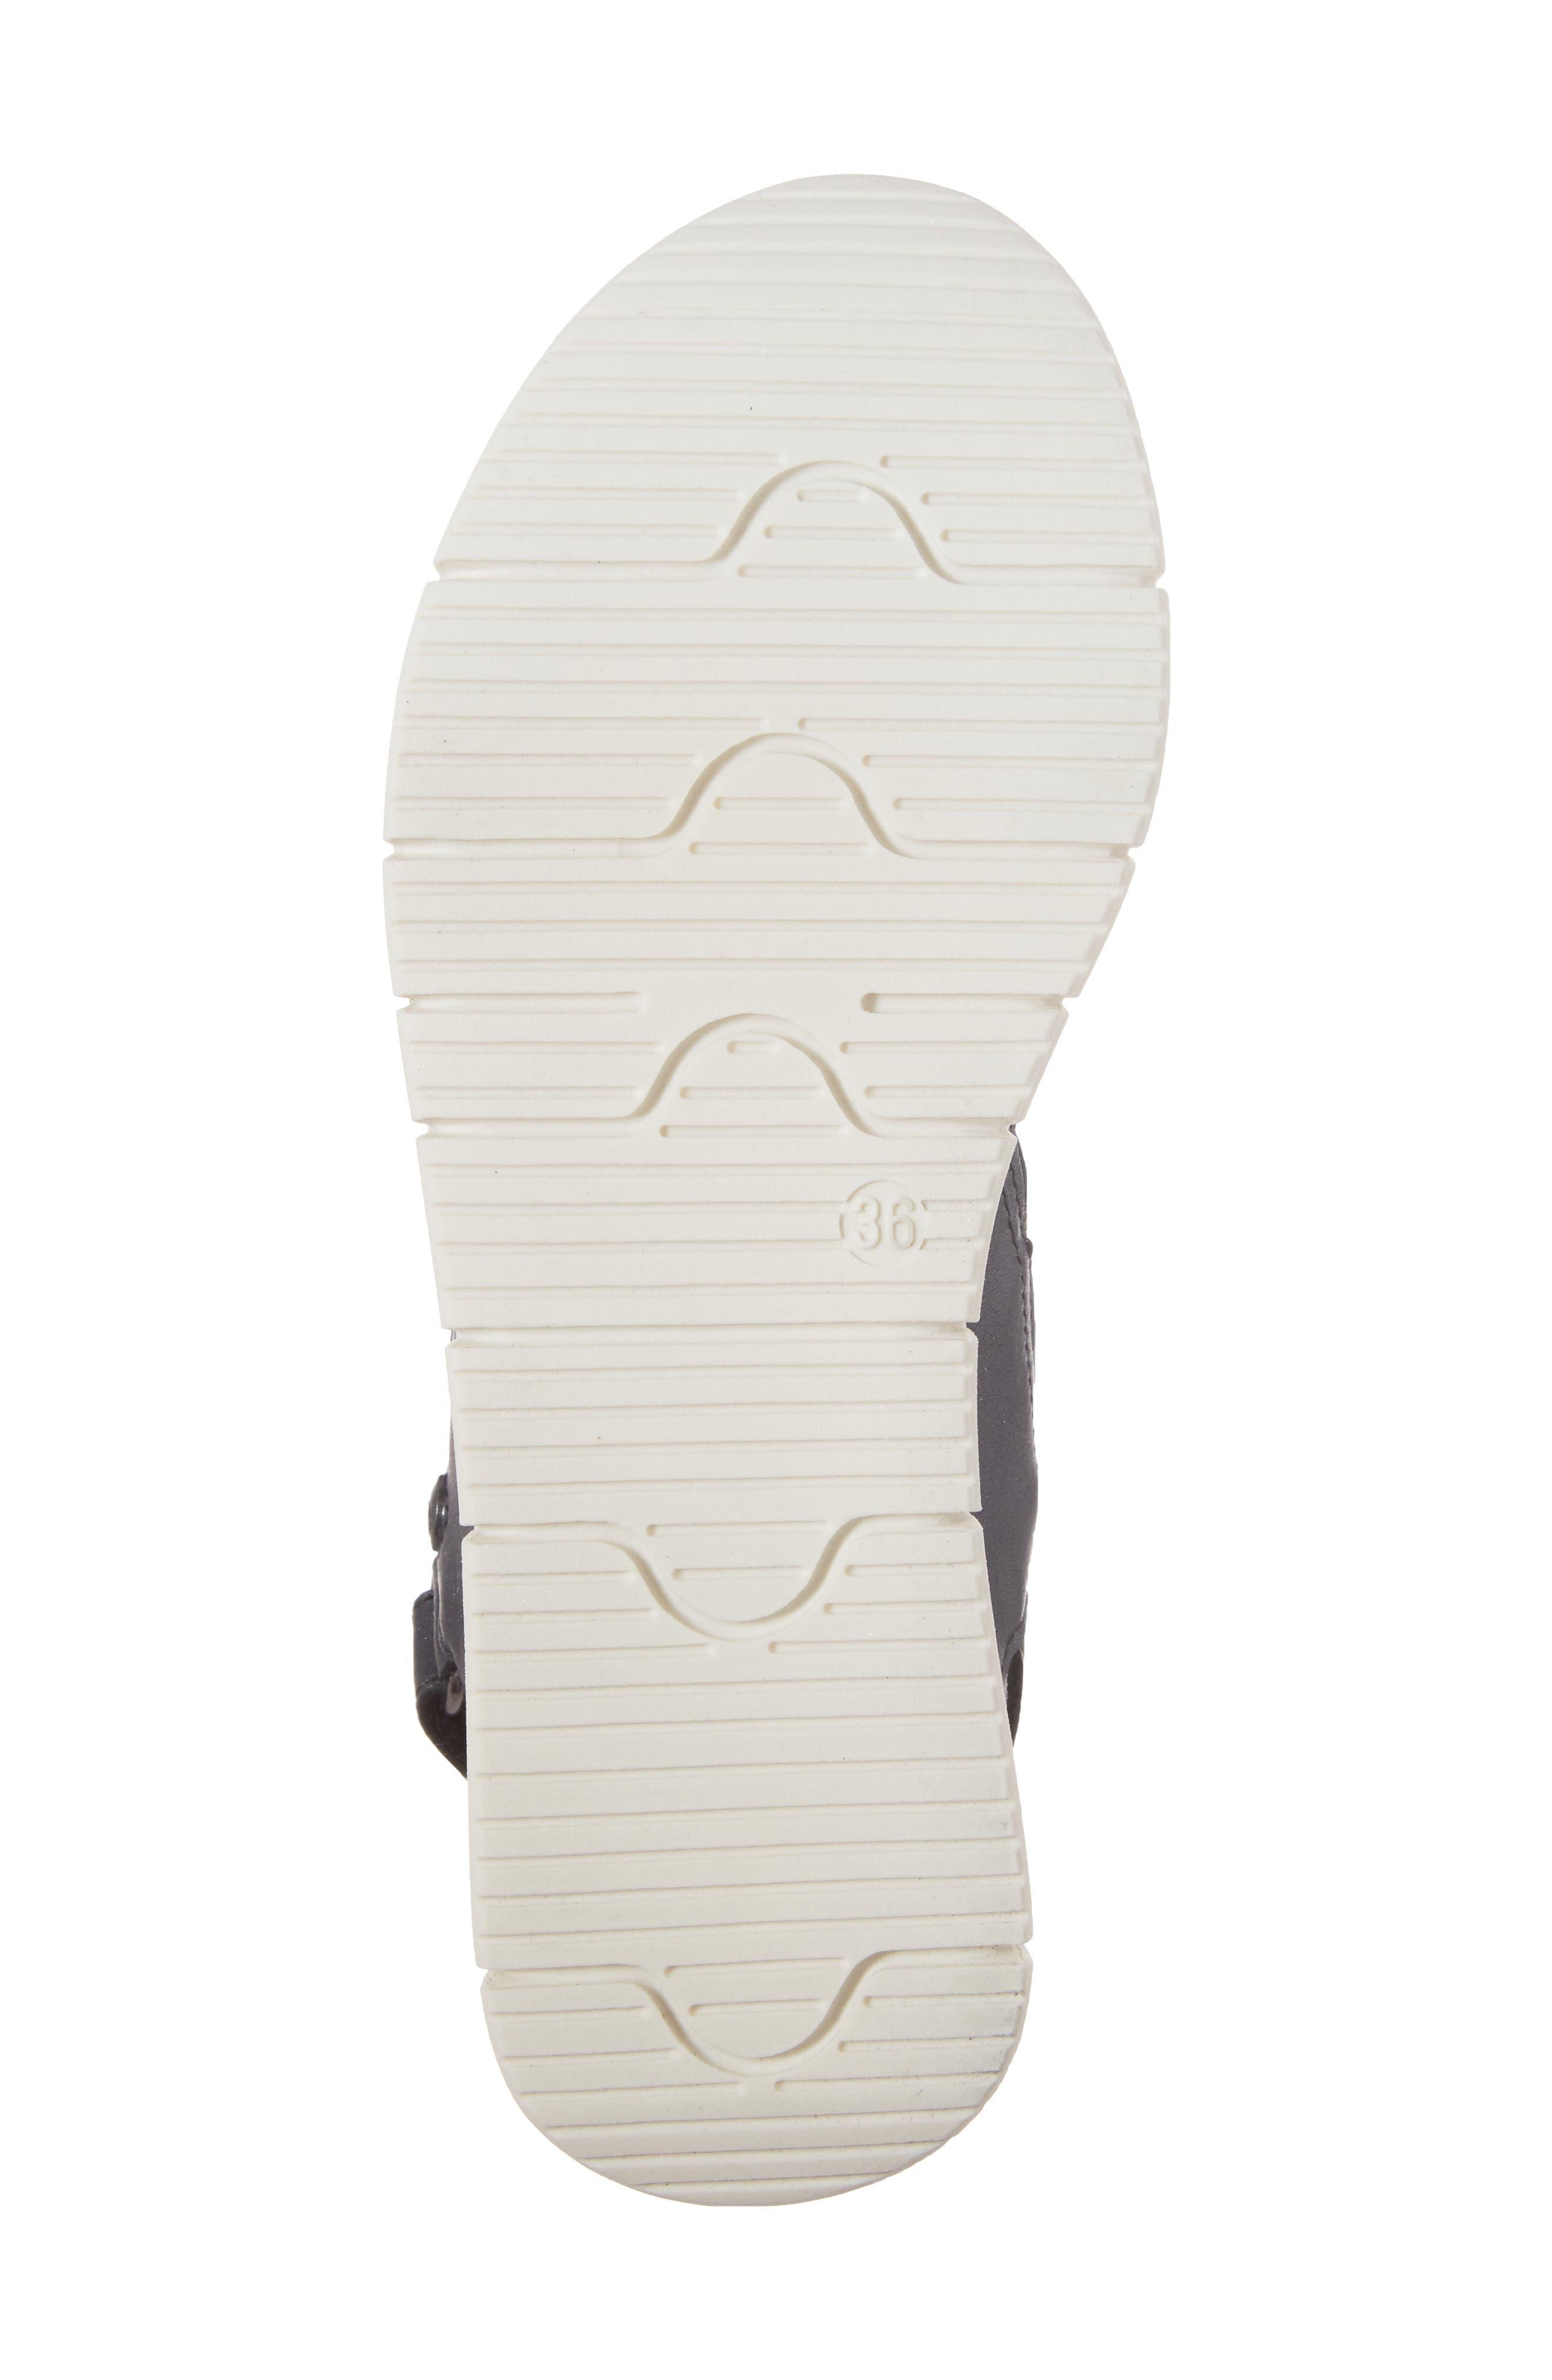 Payge Wedge Sandal,                             Alternate thumbnail 6, color,                             BLACK LEATHER